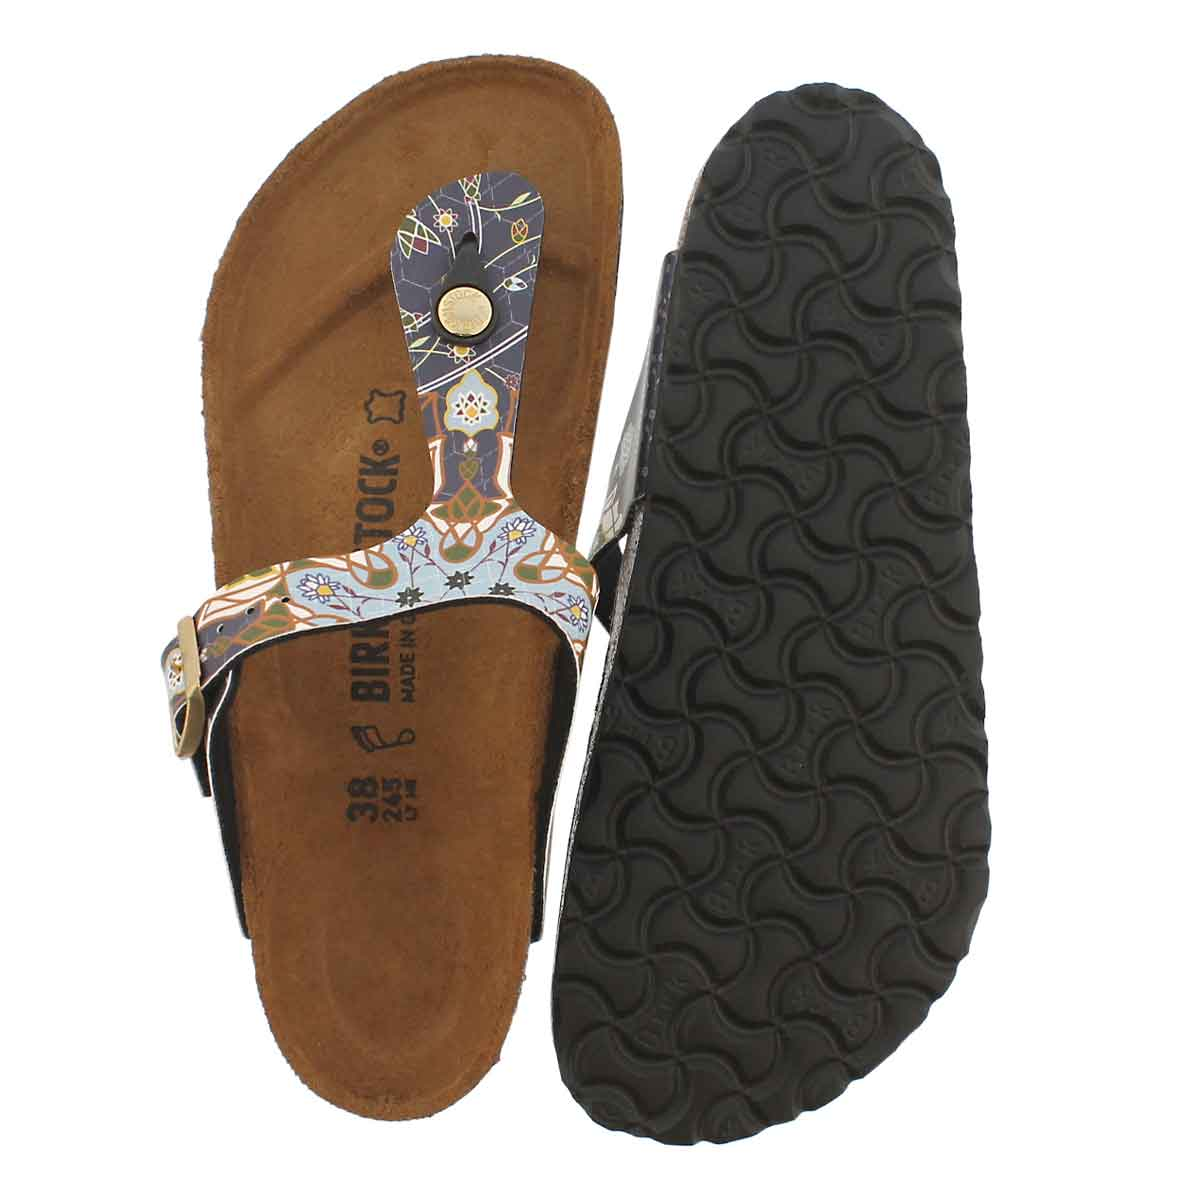 Lds Gizeh BF ancient mosaic blue sandal